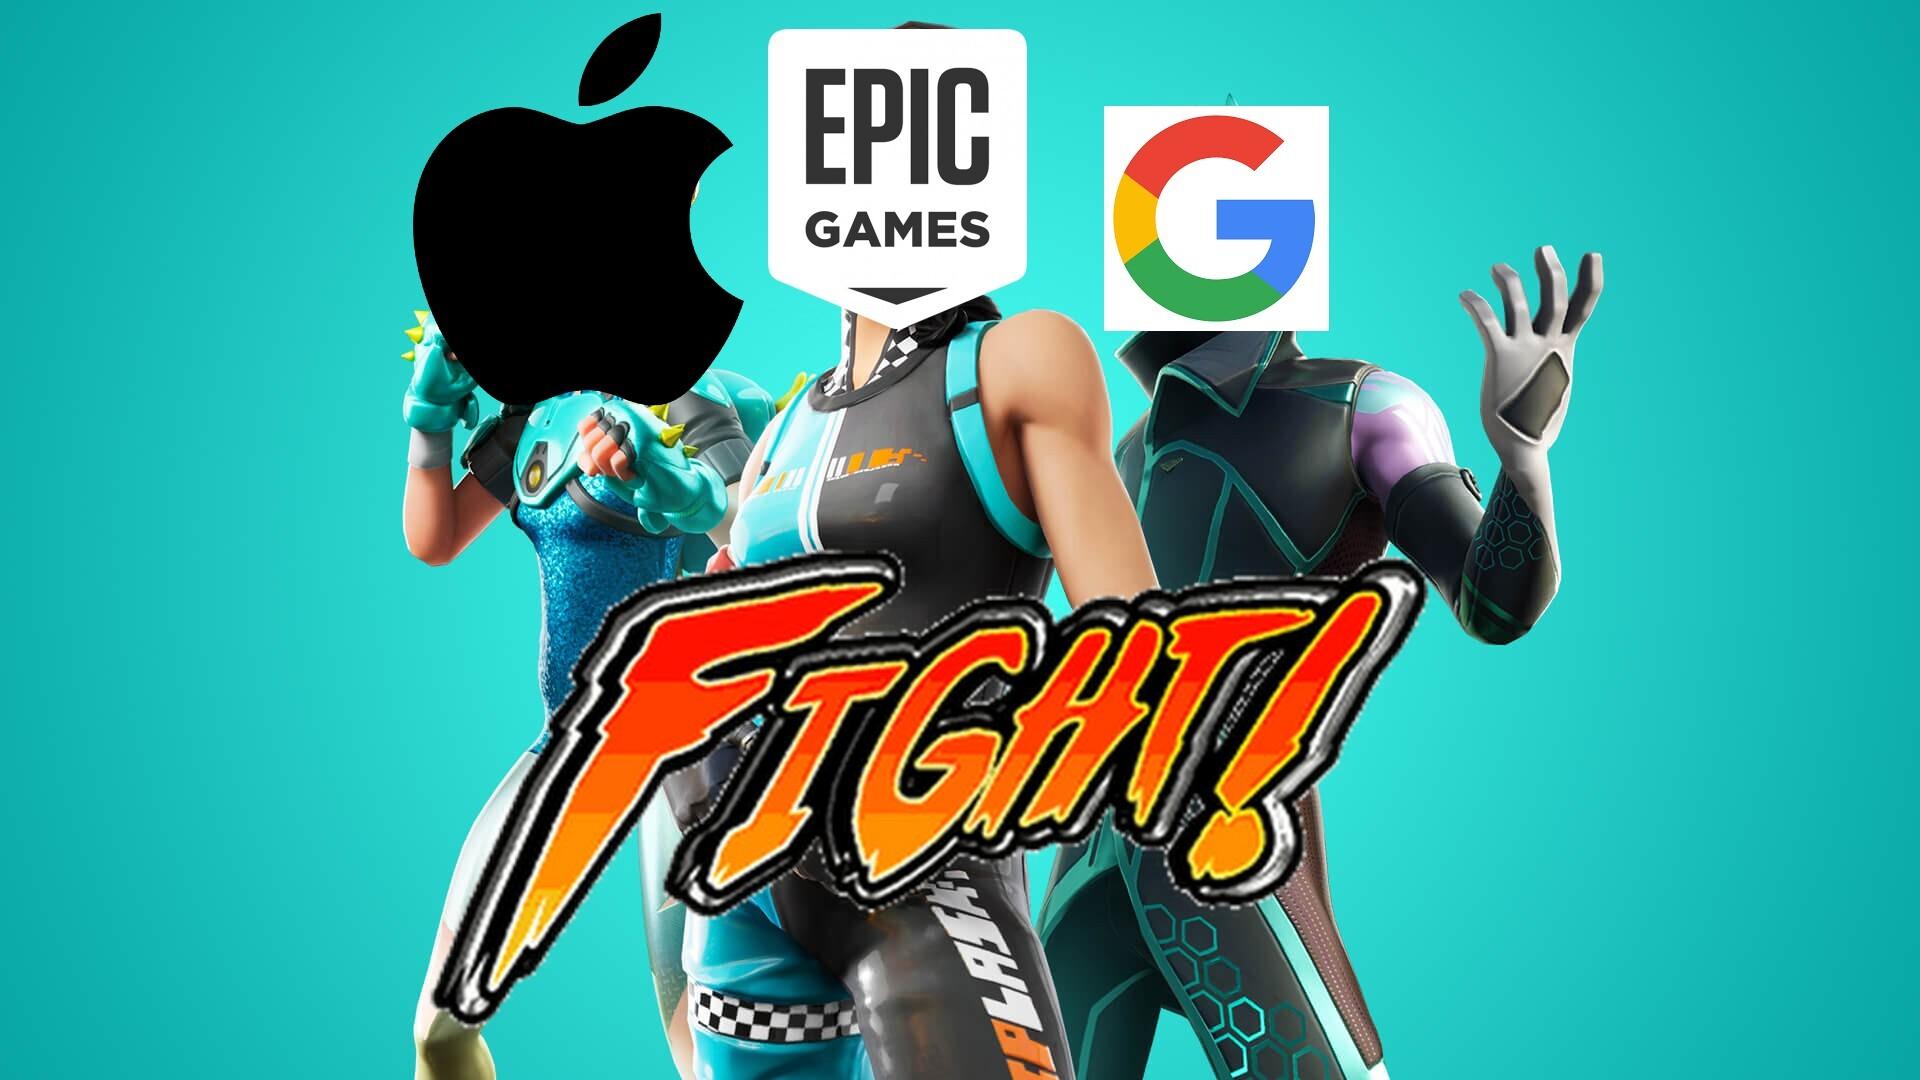 Epic / Apple / Google